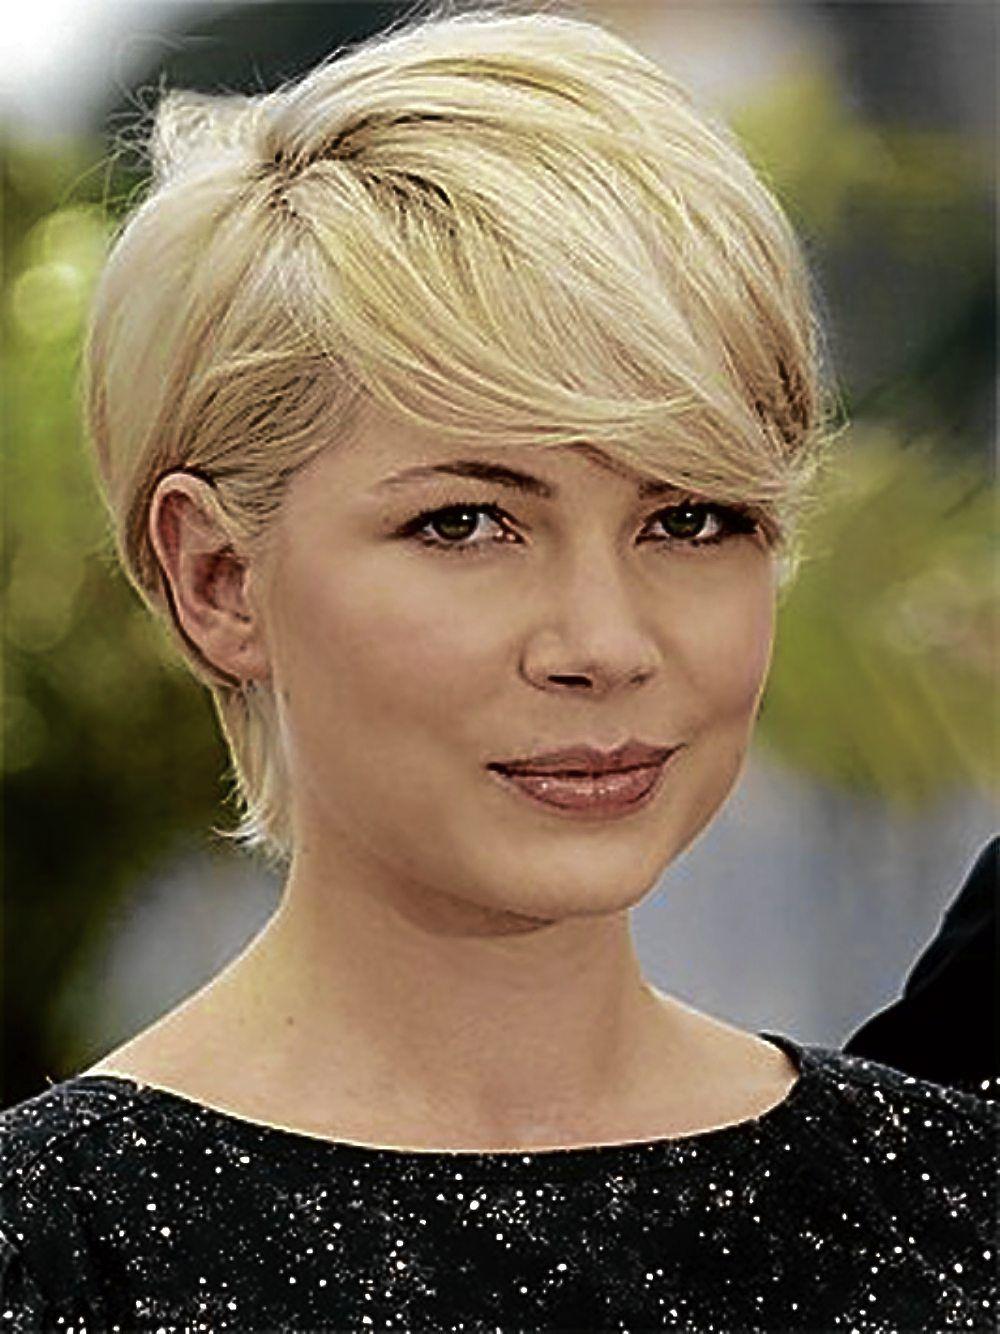 short hairstyles: short hair - pixie highlights, frankie sandford